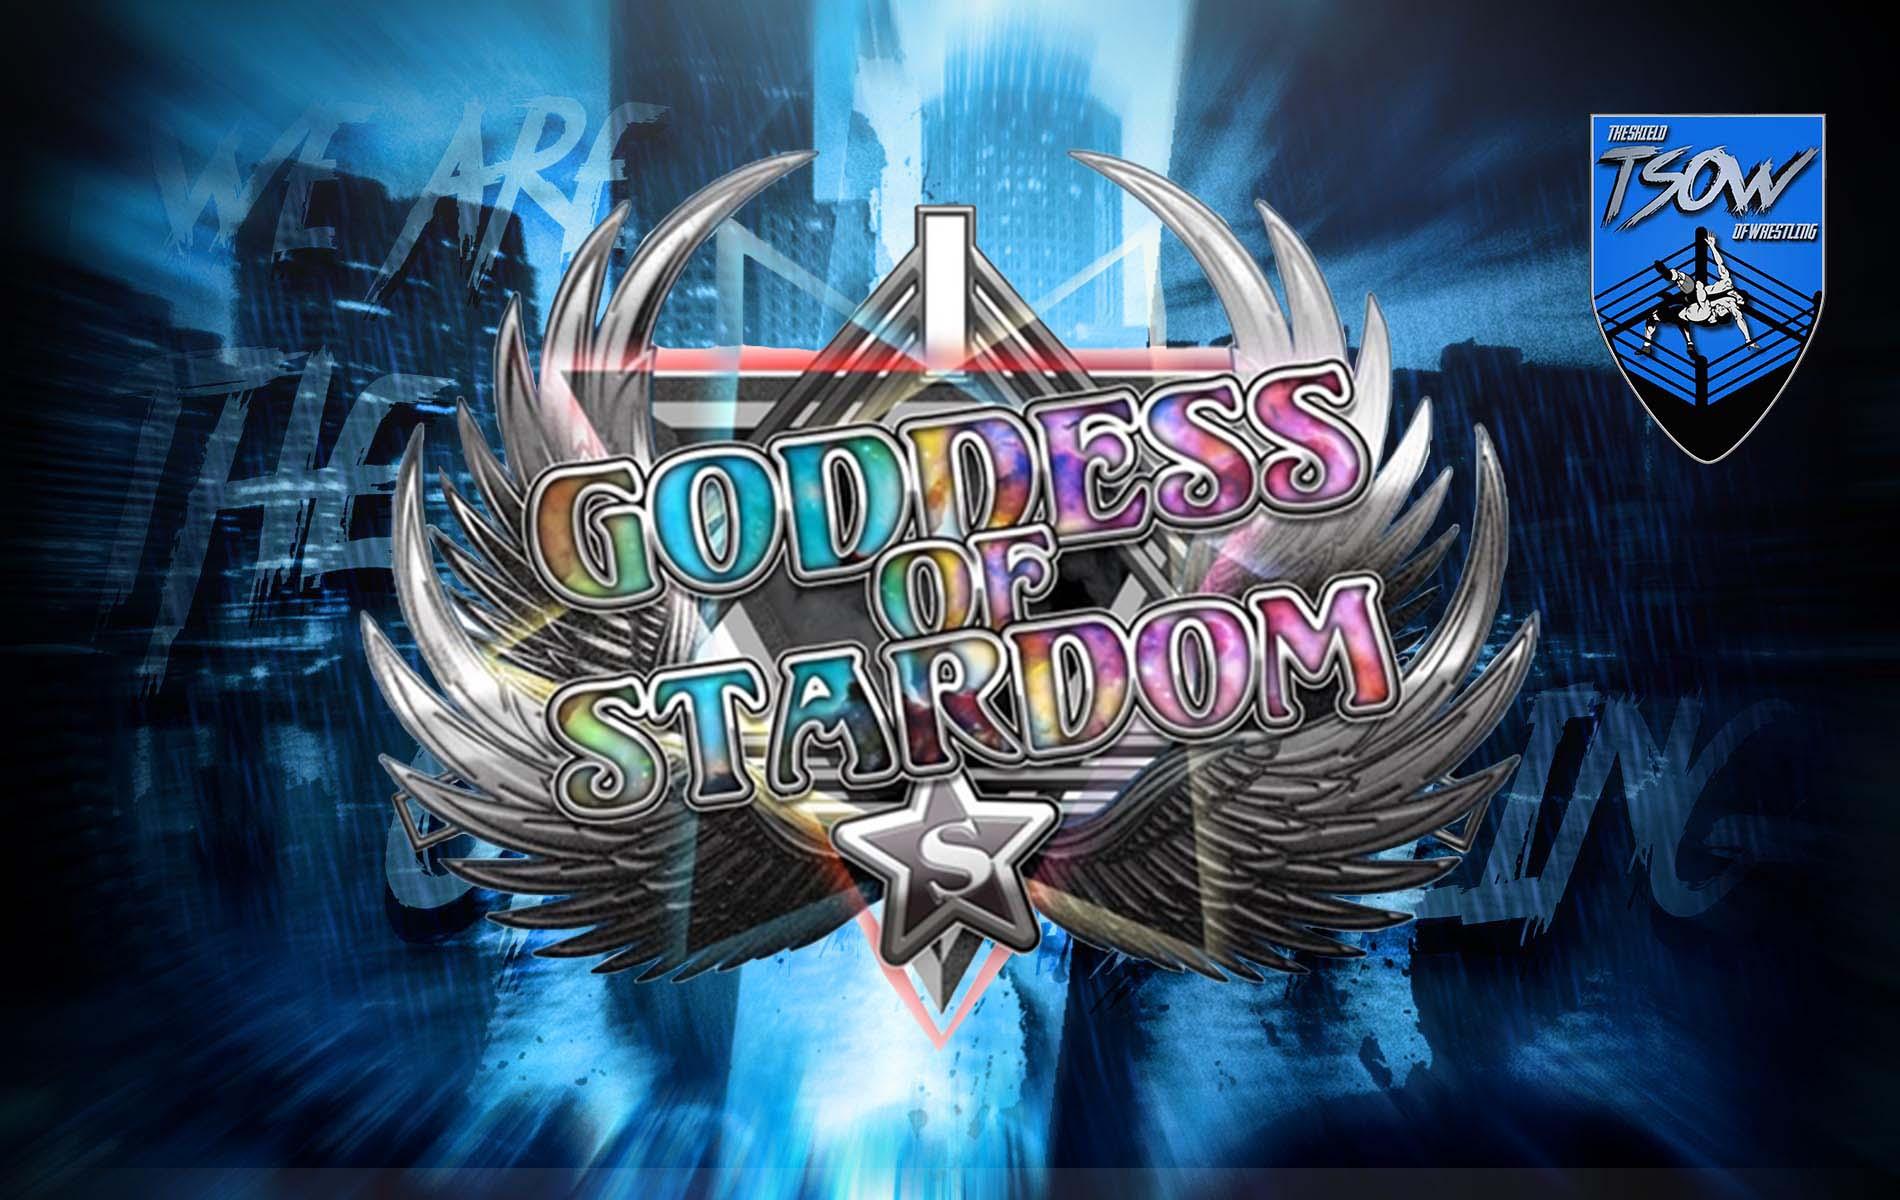 STARDOM Goddess of Stardom Tag League 2020 Risultati – Day 1